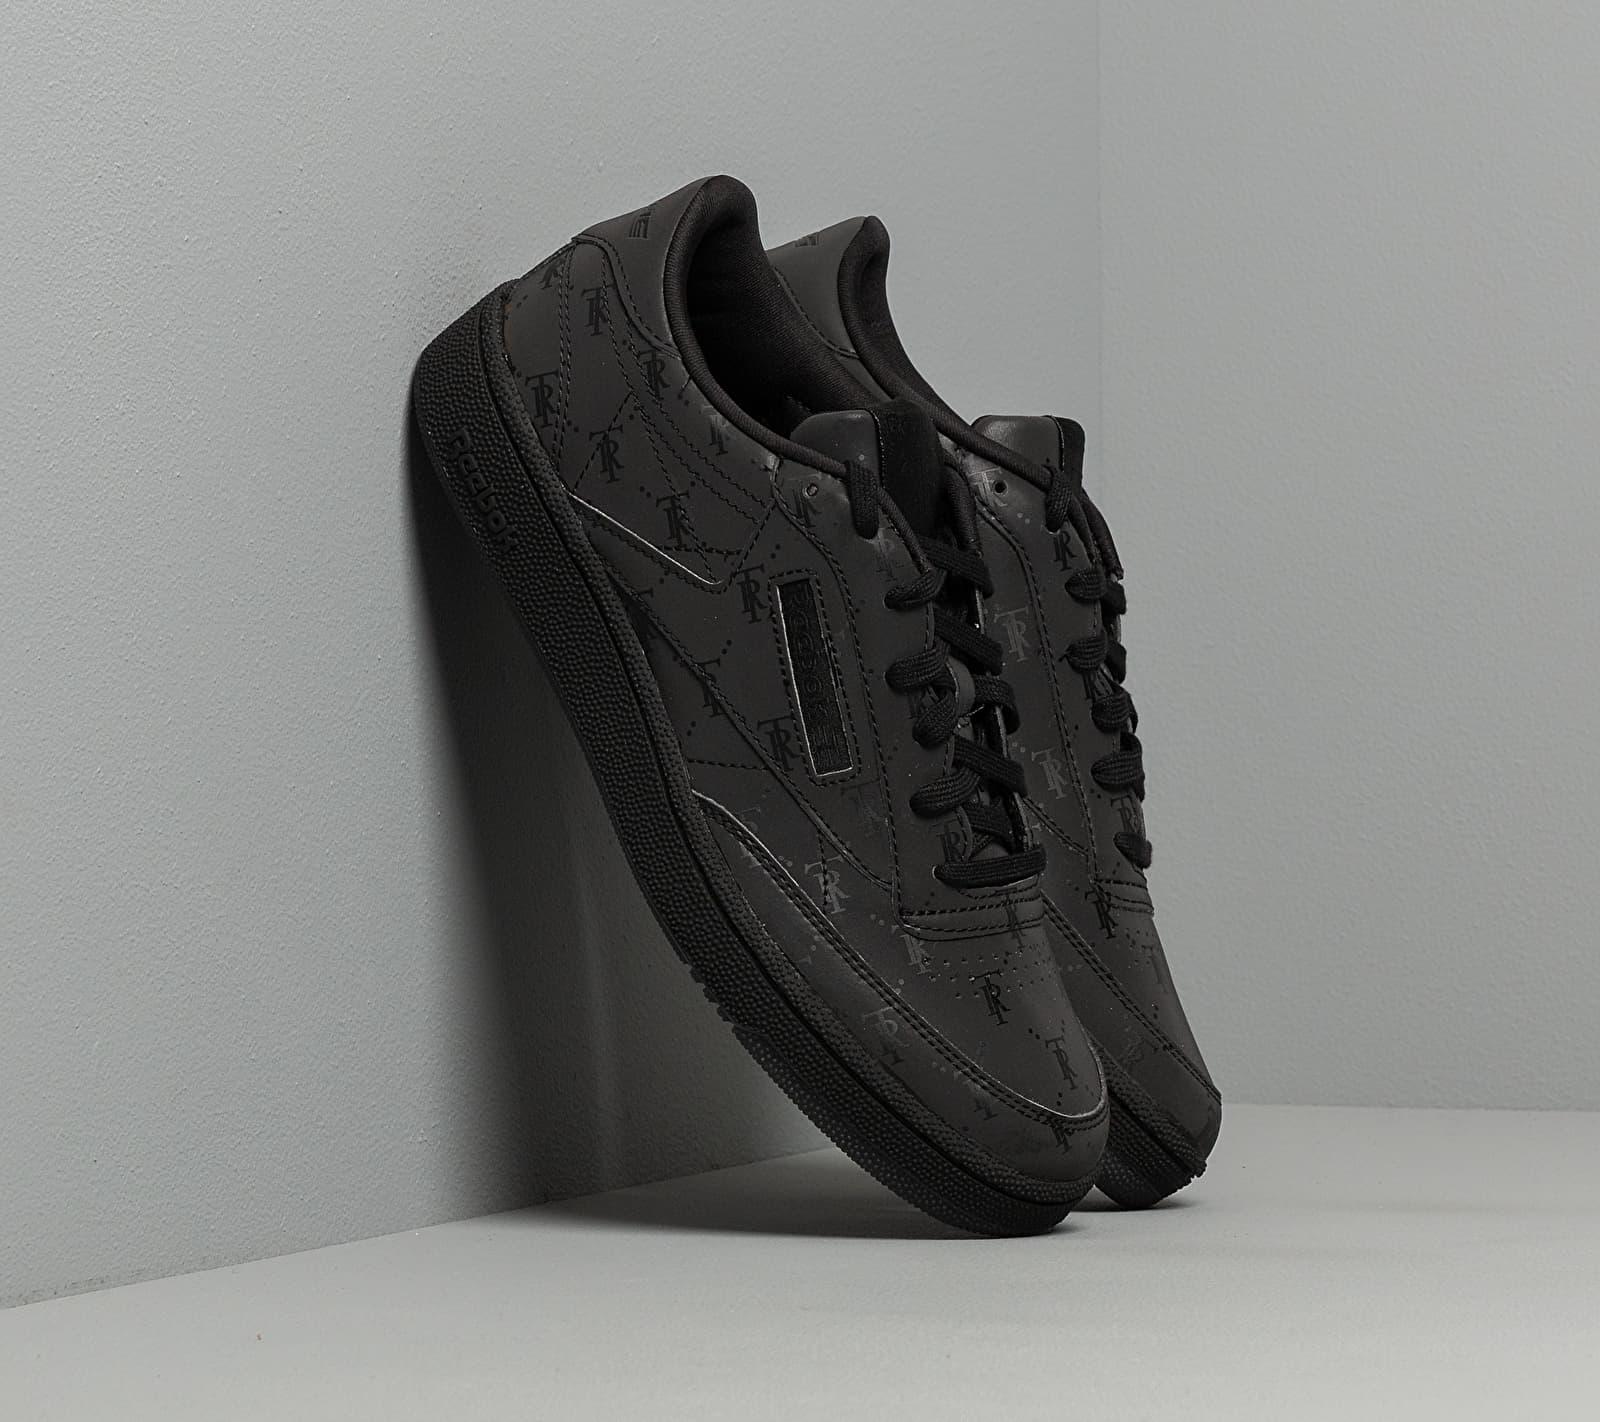 Reebok x Trés Rasché Club C 85 MU Black/ Black/ Black EUR 44.5